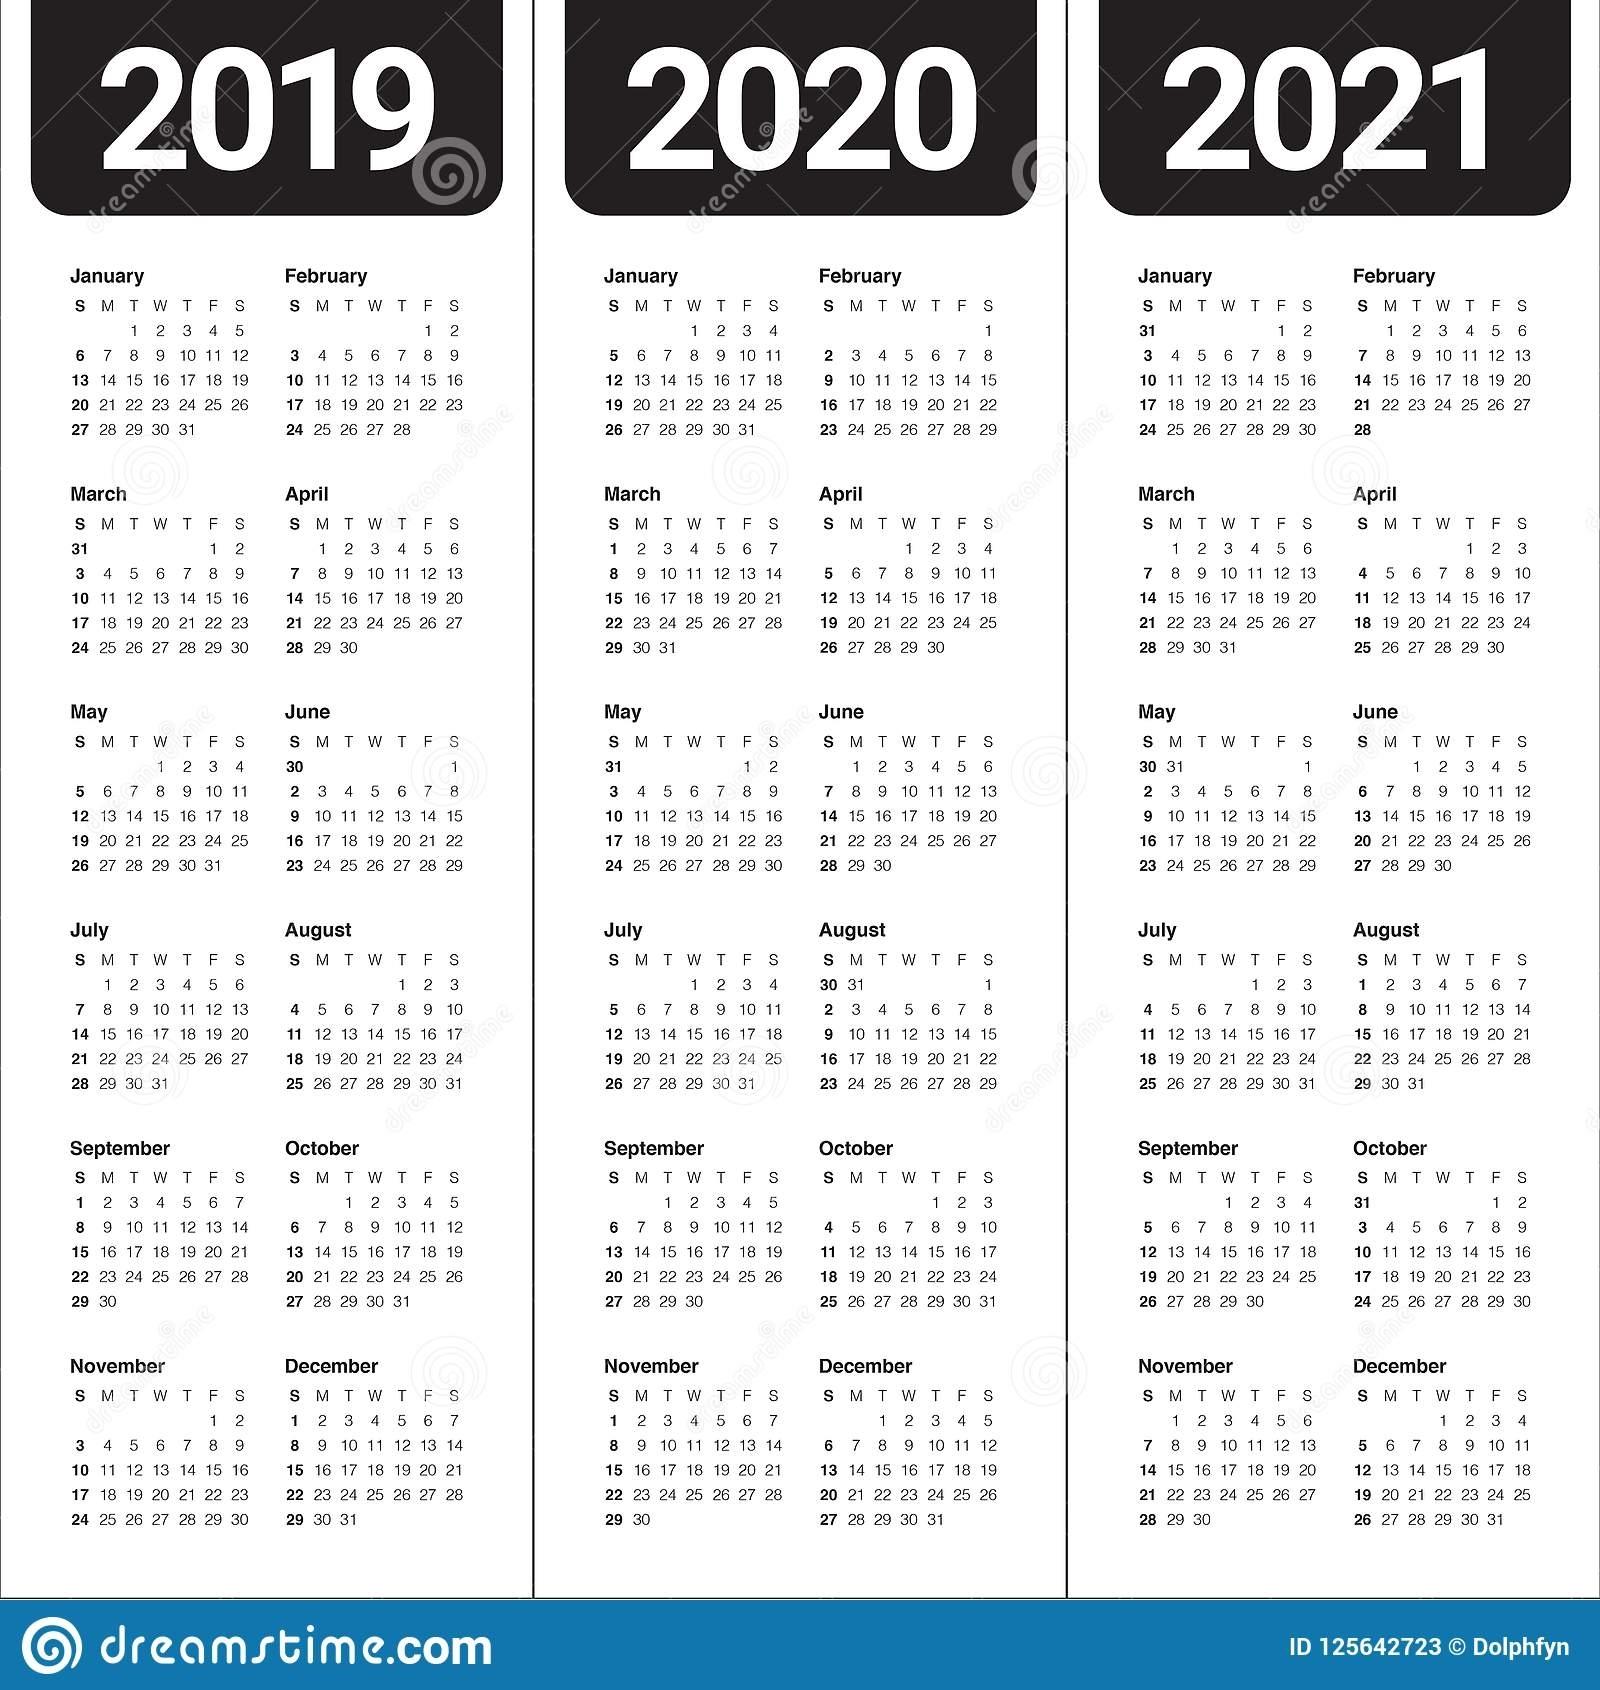 6 Year Calendar 2020 To 2021 | Month Calendar Printable